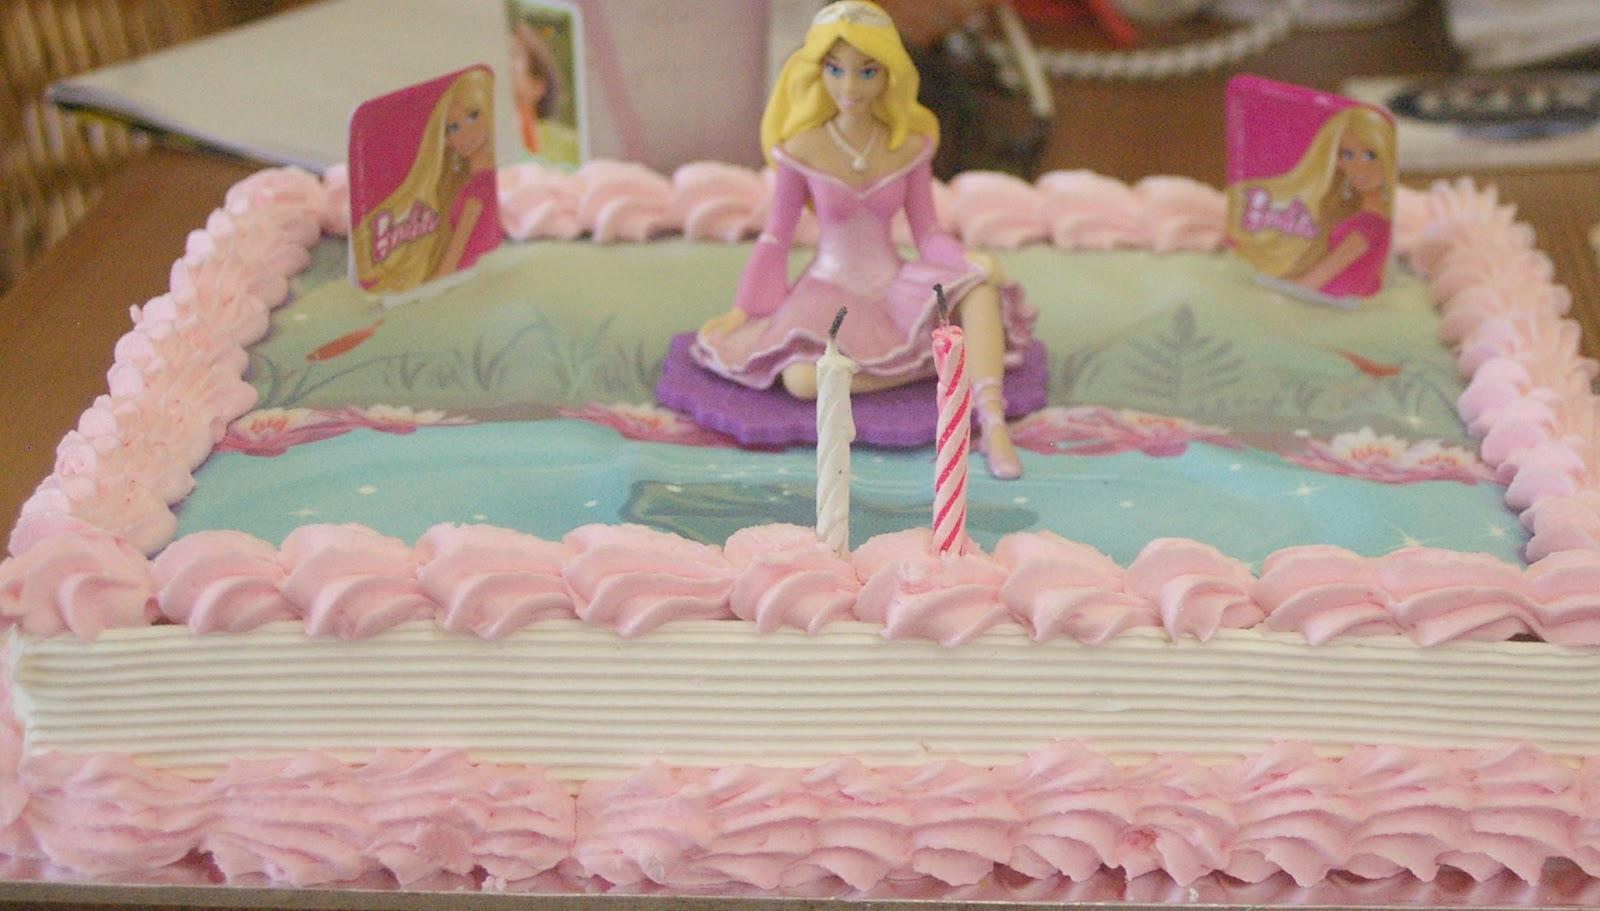 My recent birthday Domesblissity